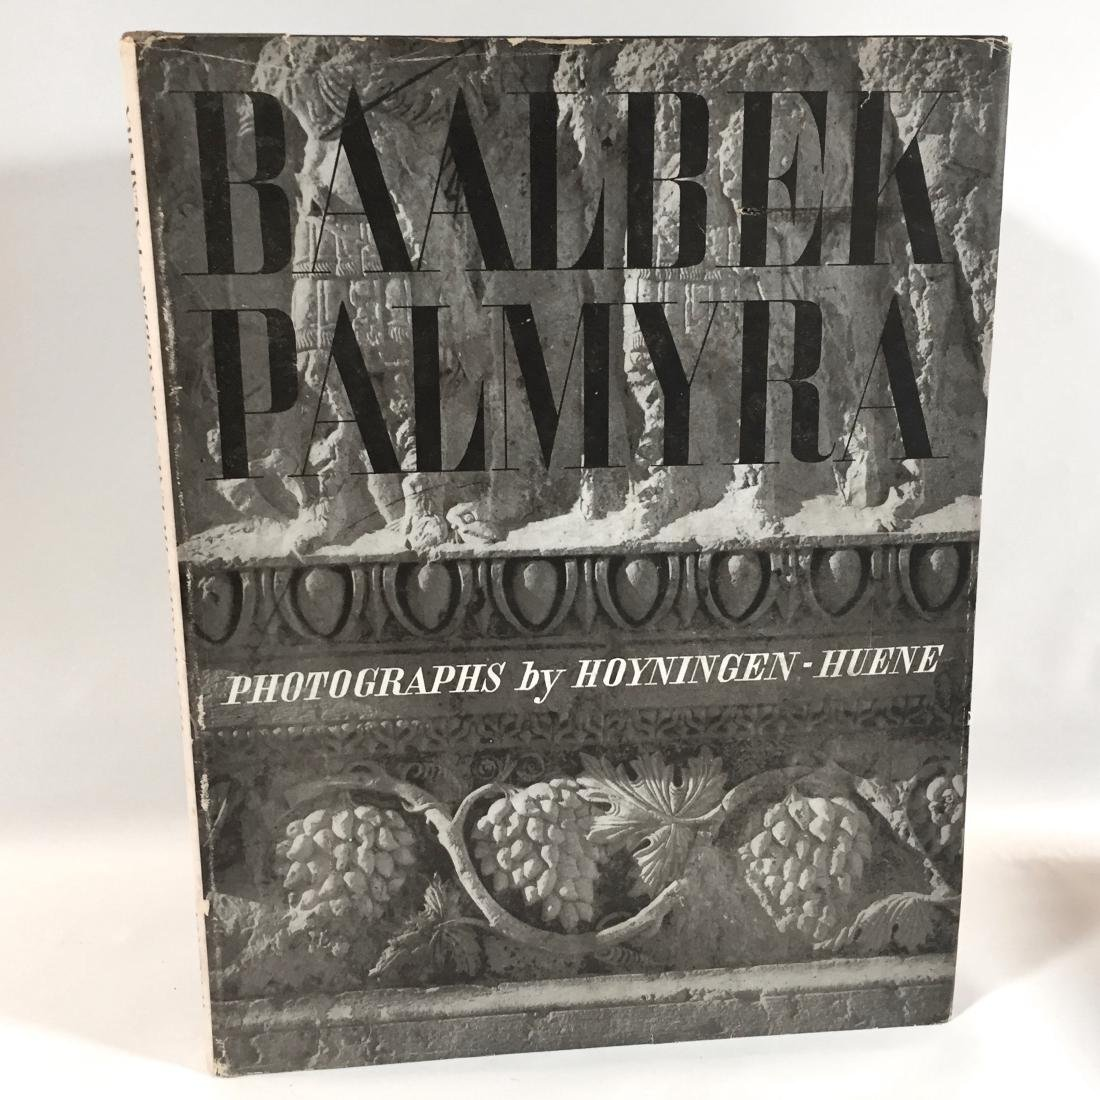 Baalbek Palmyra David M. Robinson First Edition